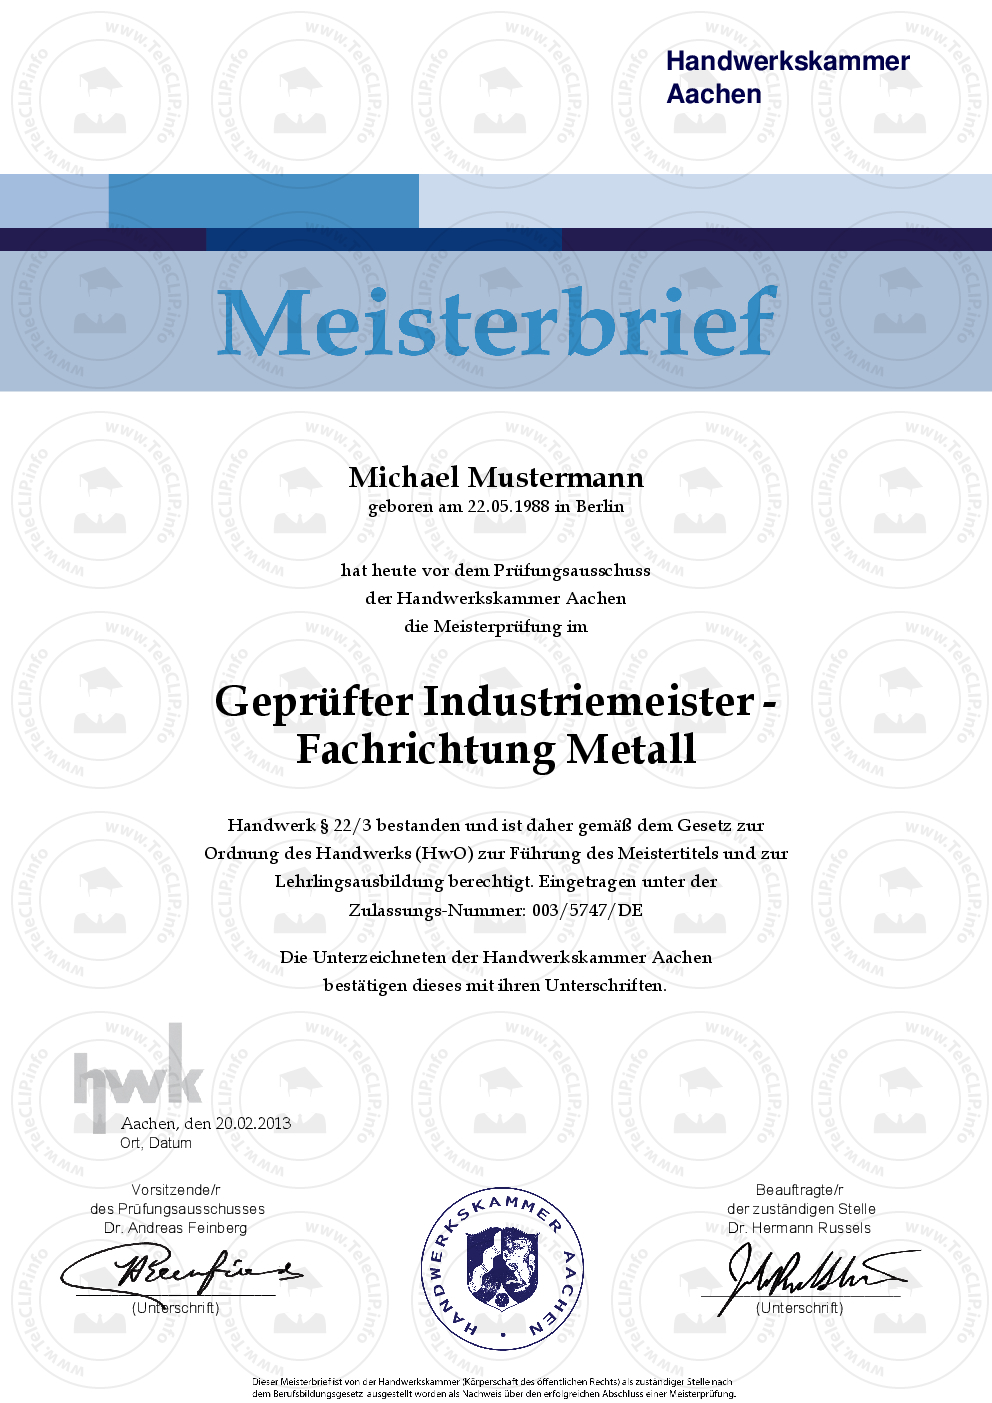 hwk_meisterbrief_8b